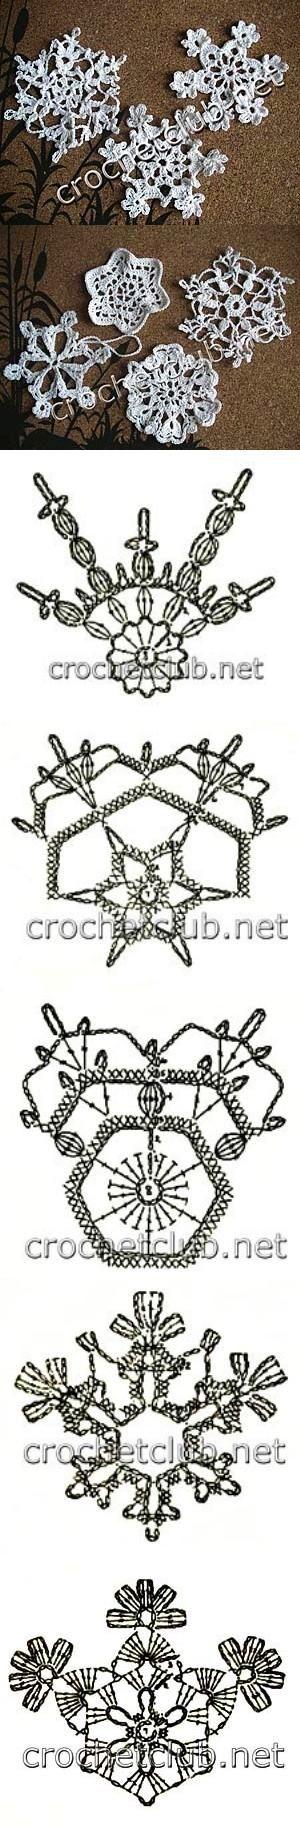 Free crochet snowflake ornament patterns.